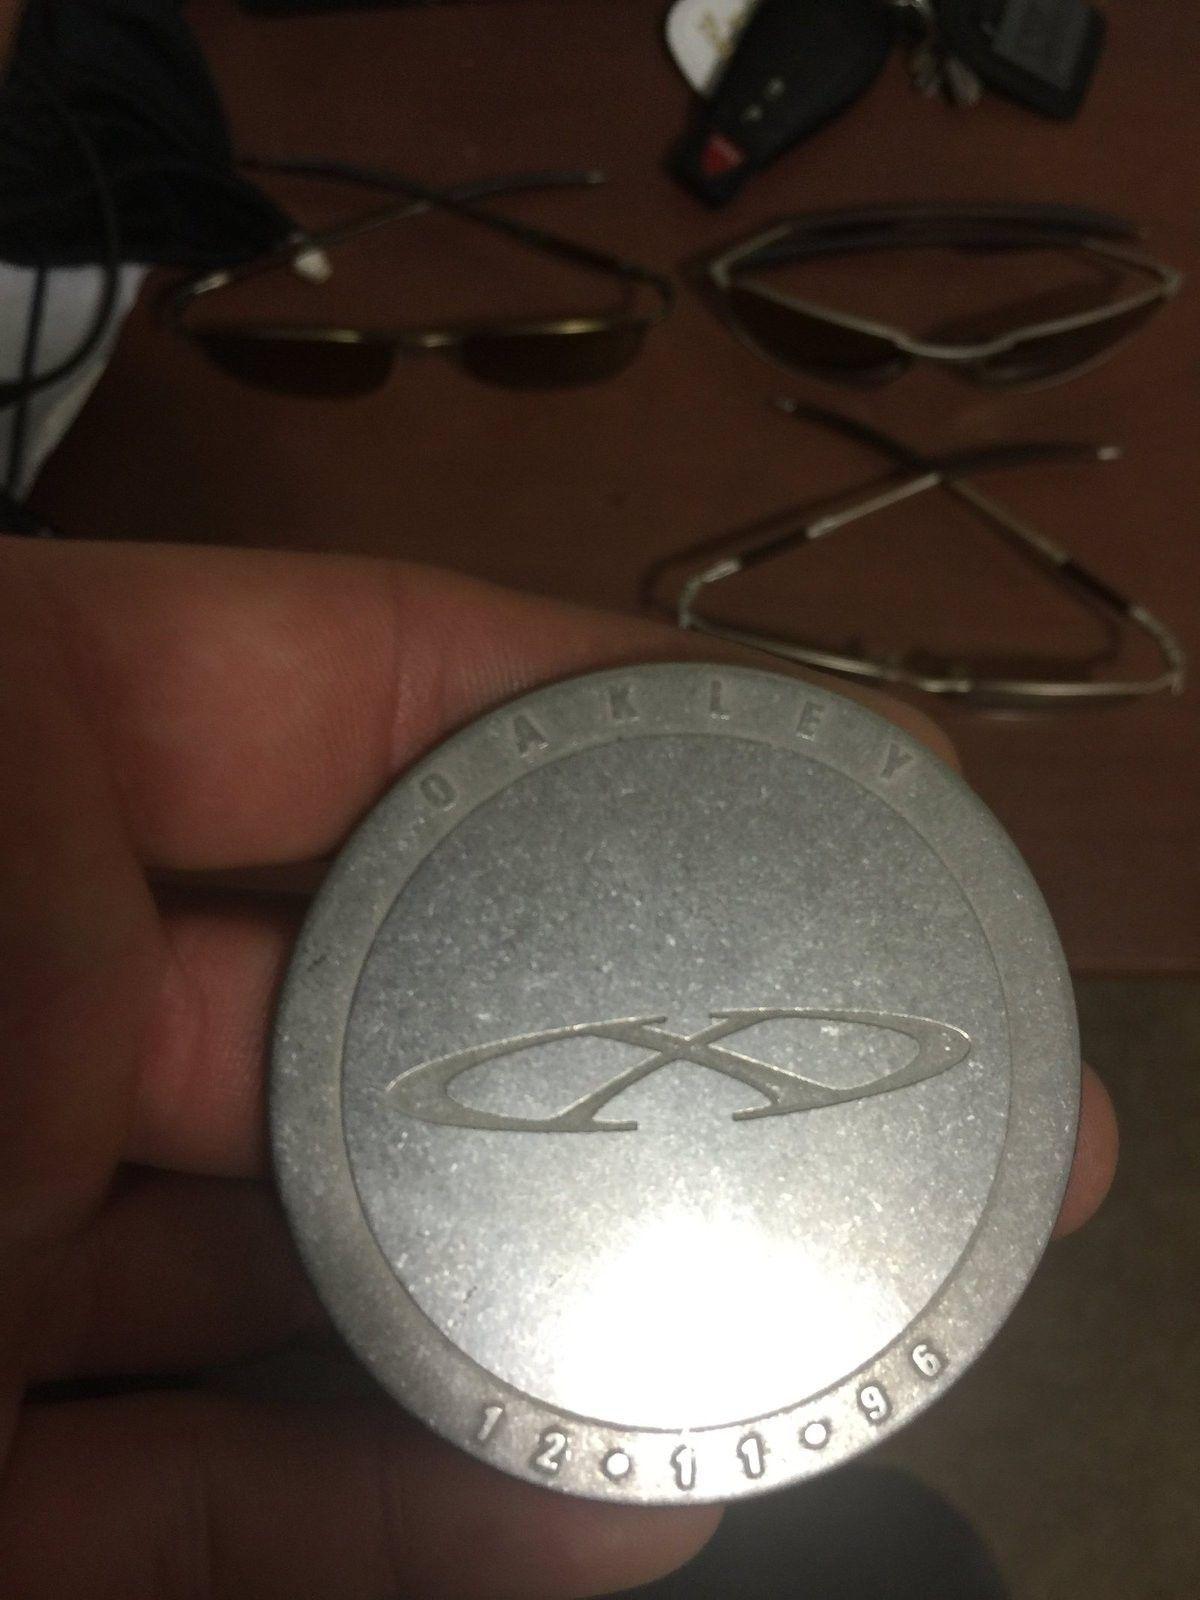 Should I trade my coin? - image.jpeg